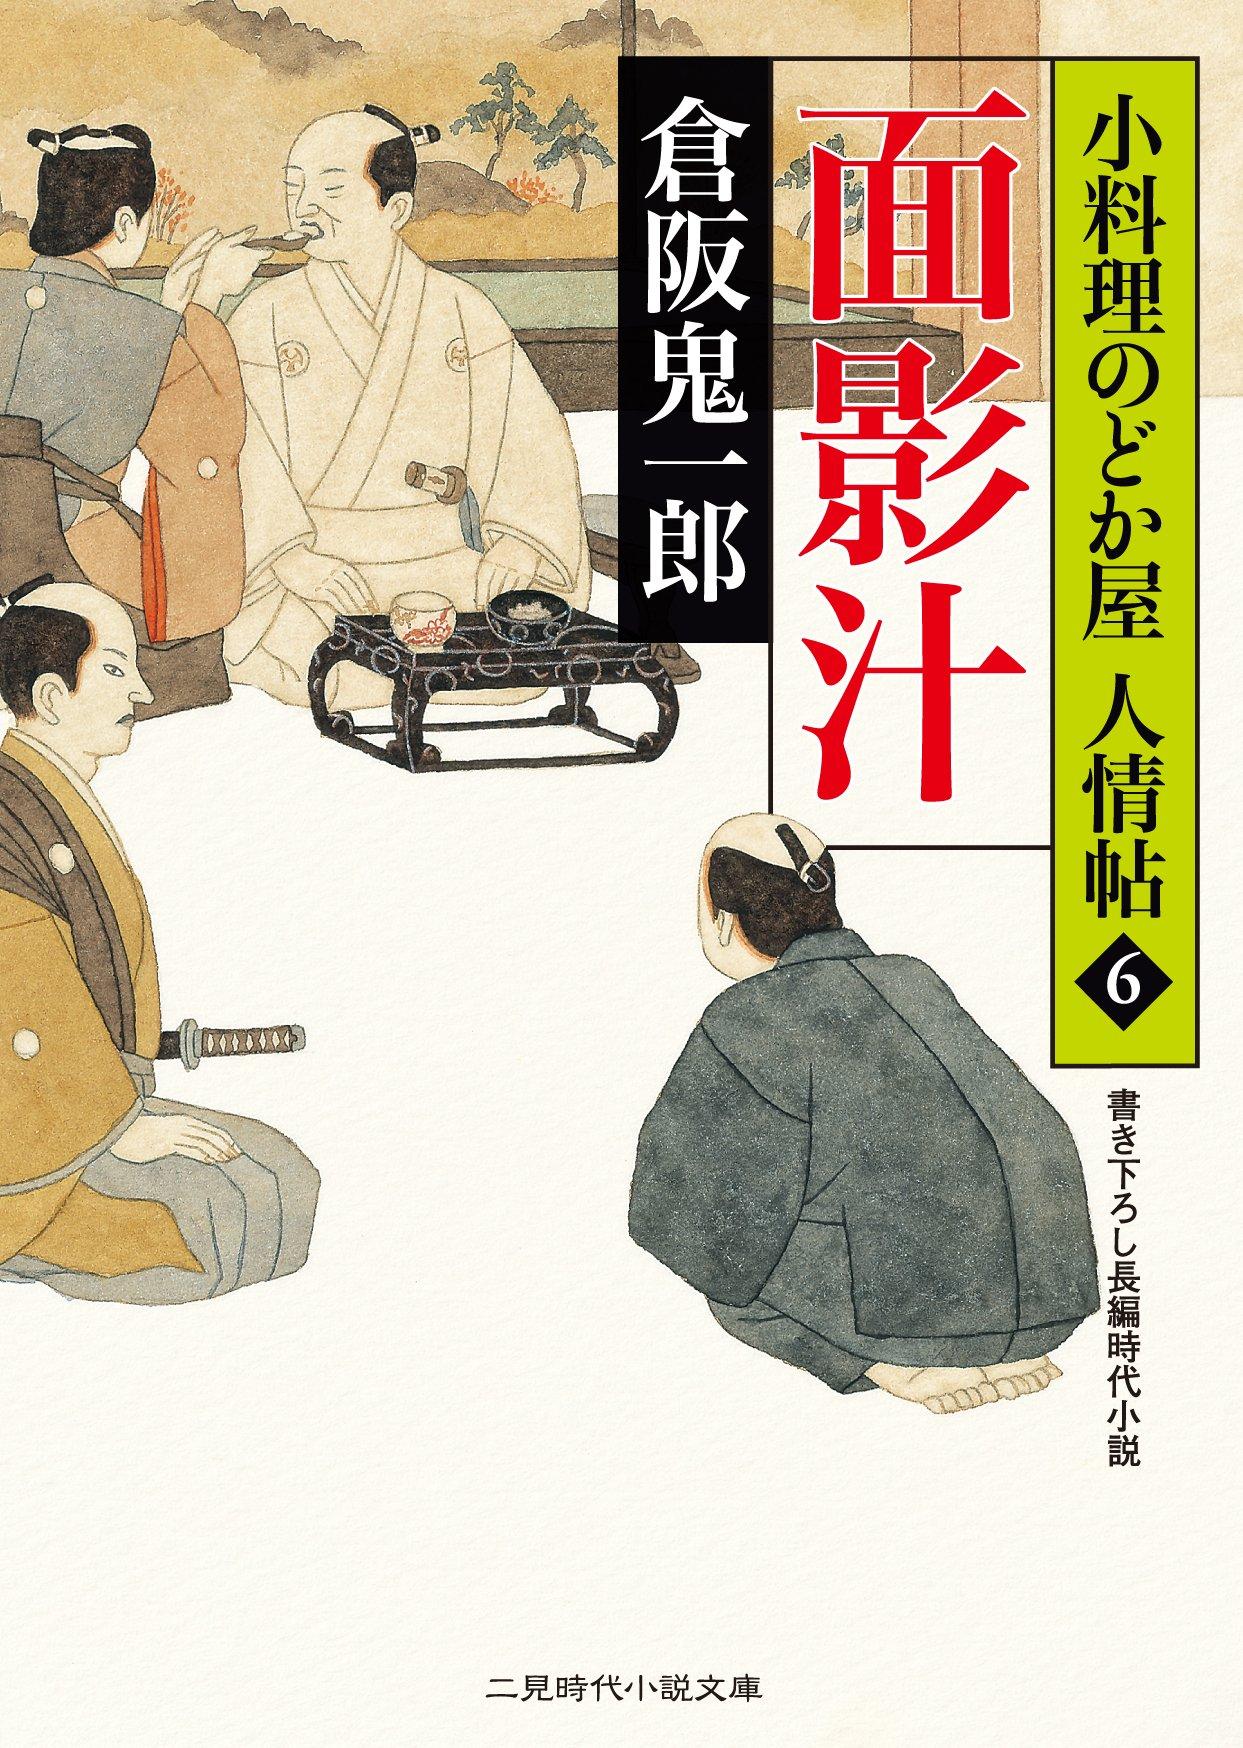 Read Online 面影汁 小料理のどか屋 人情帖6 (二見時代小説文庫) PDF